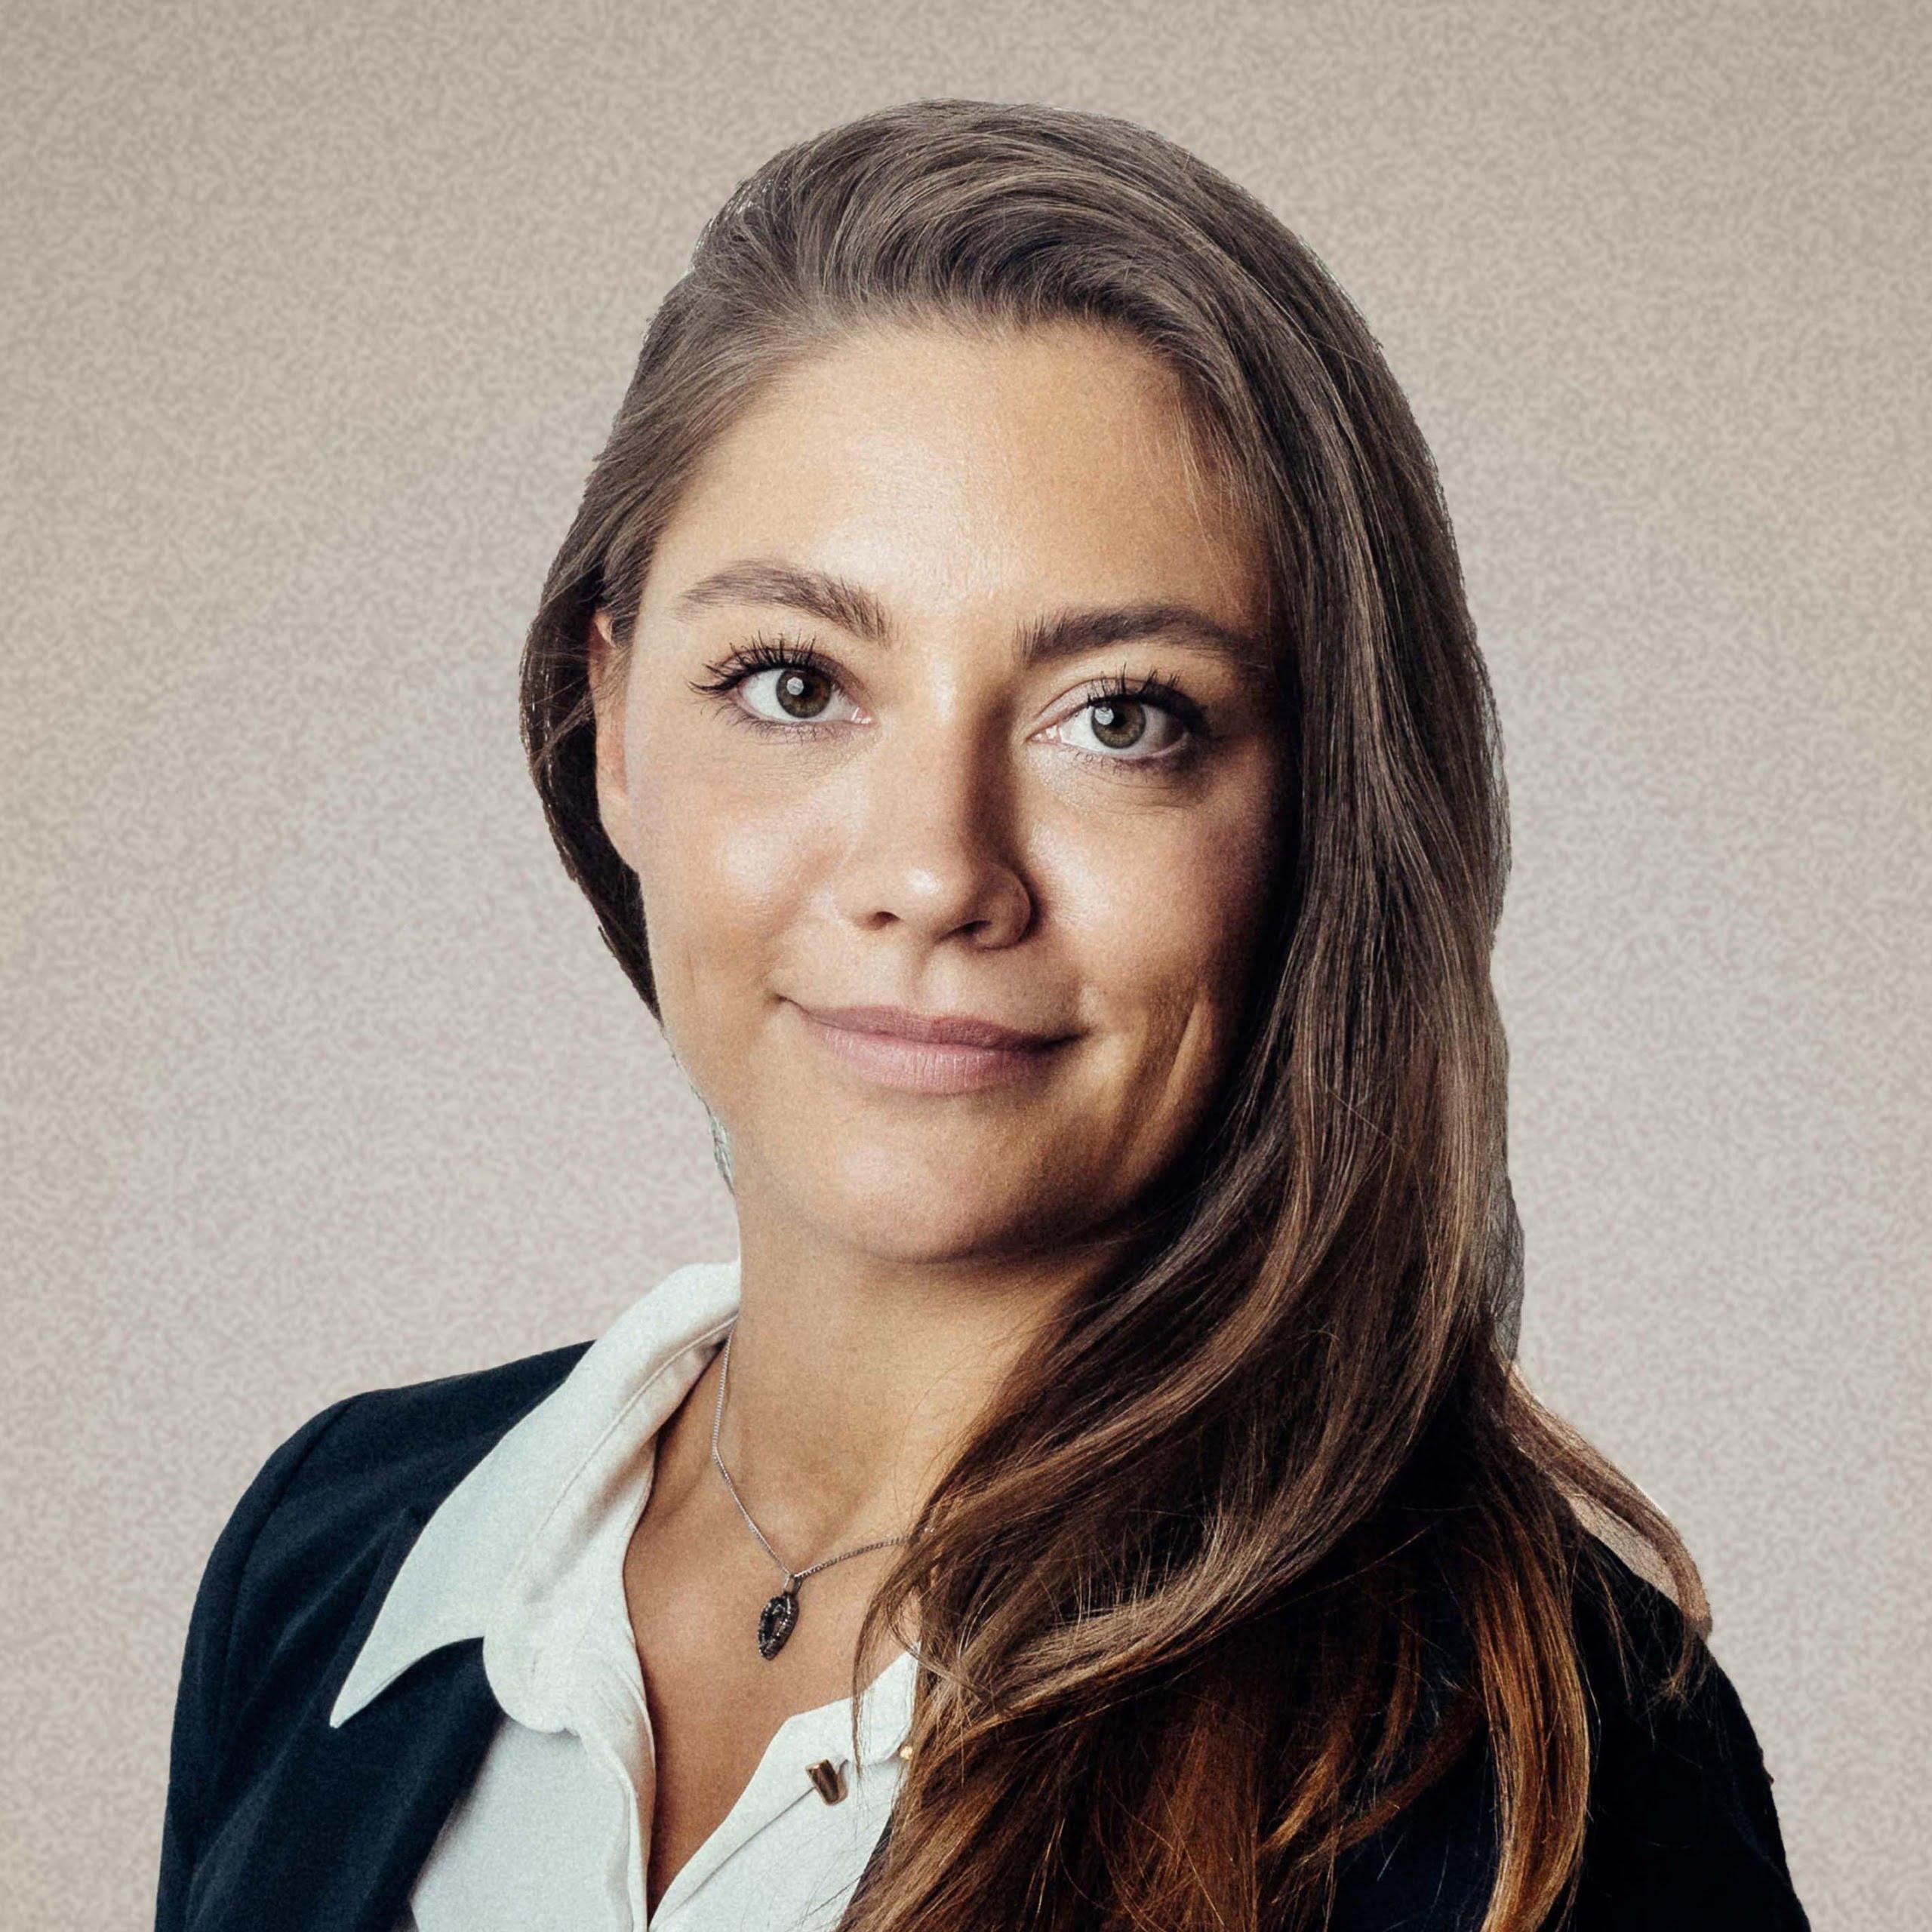 Melanie Wiechern